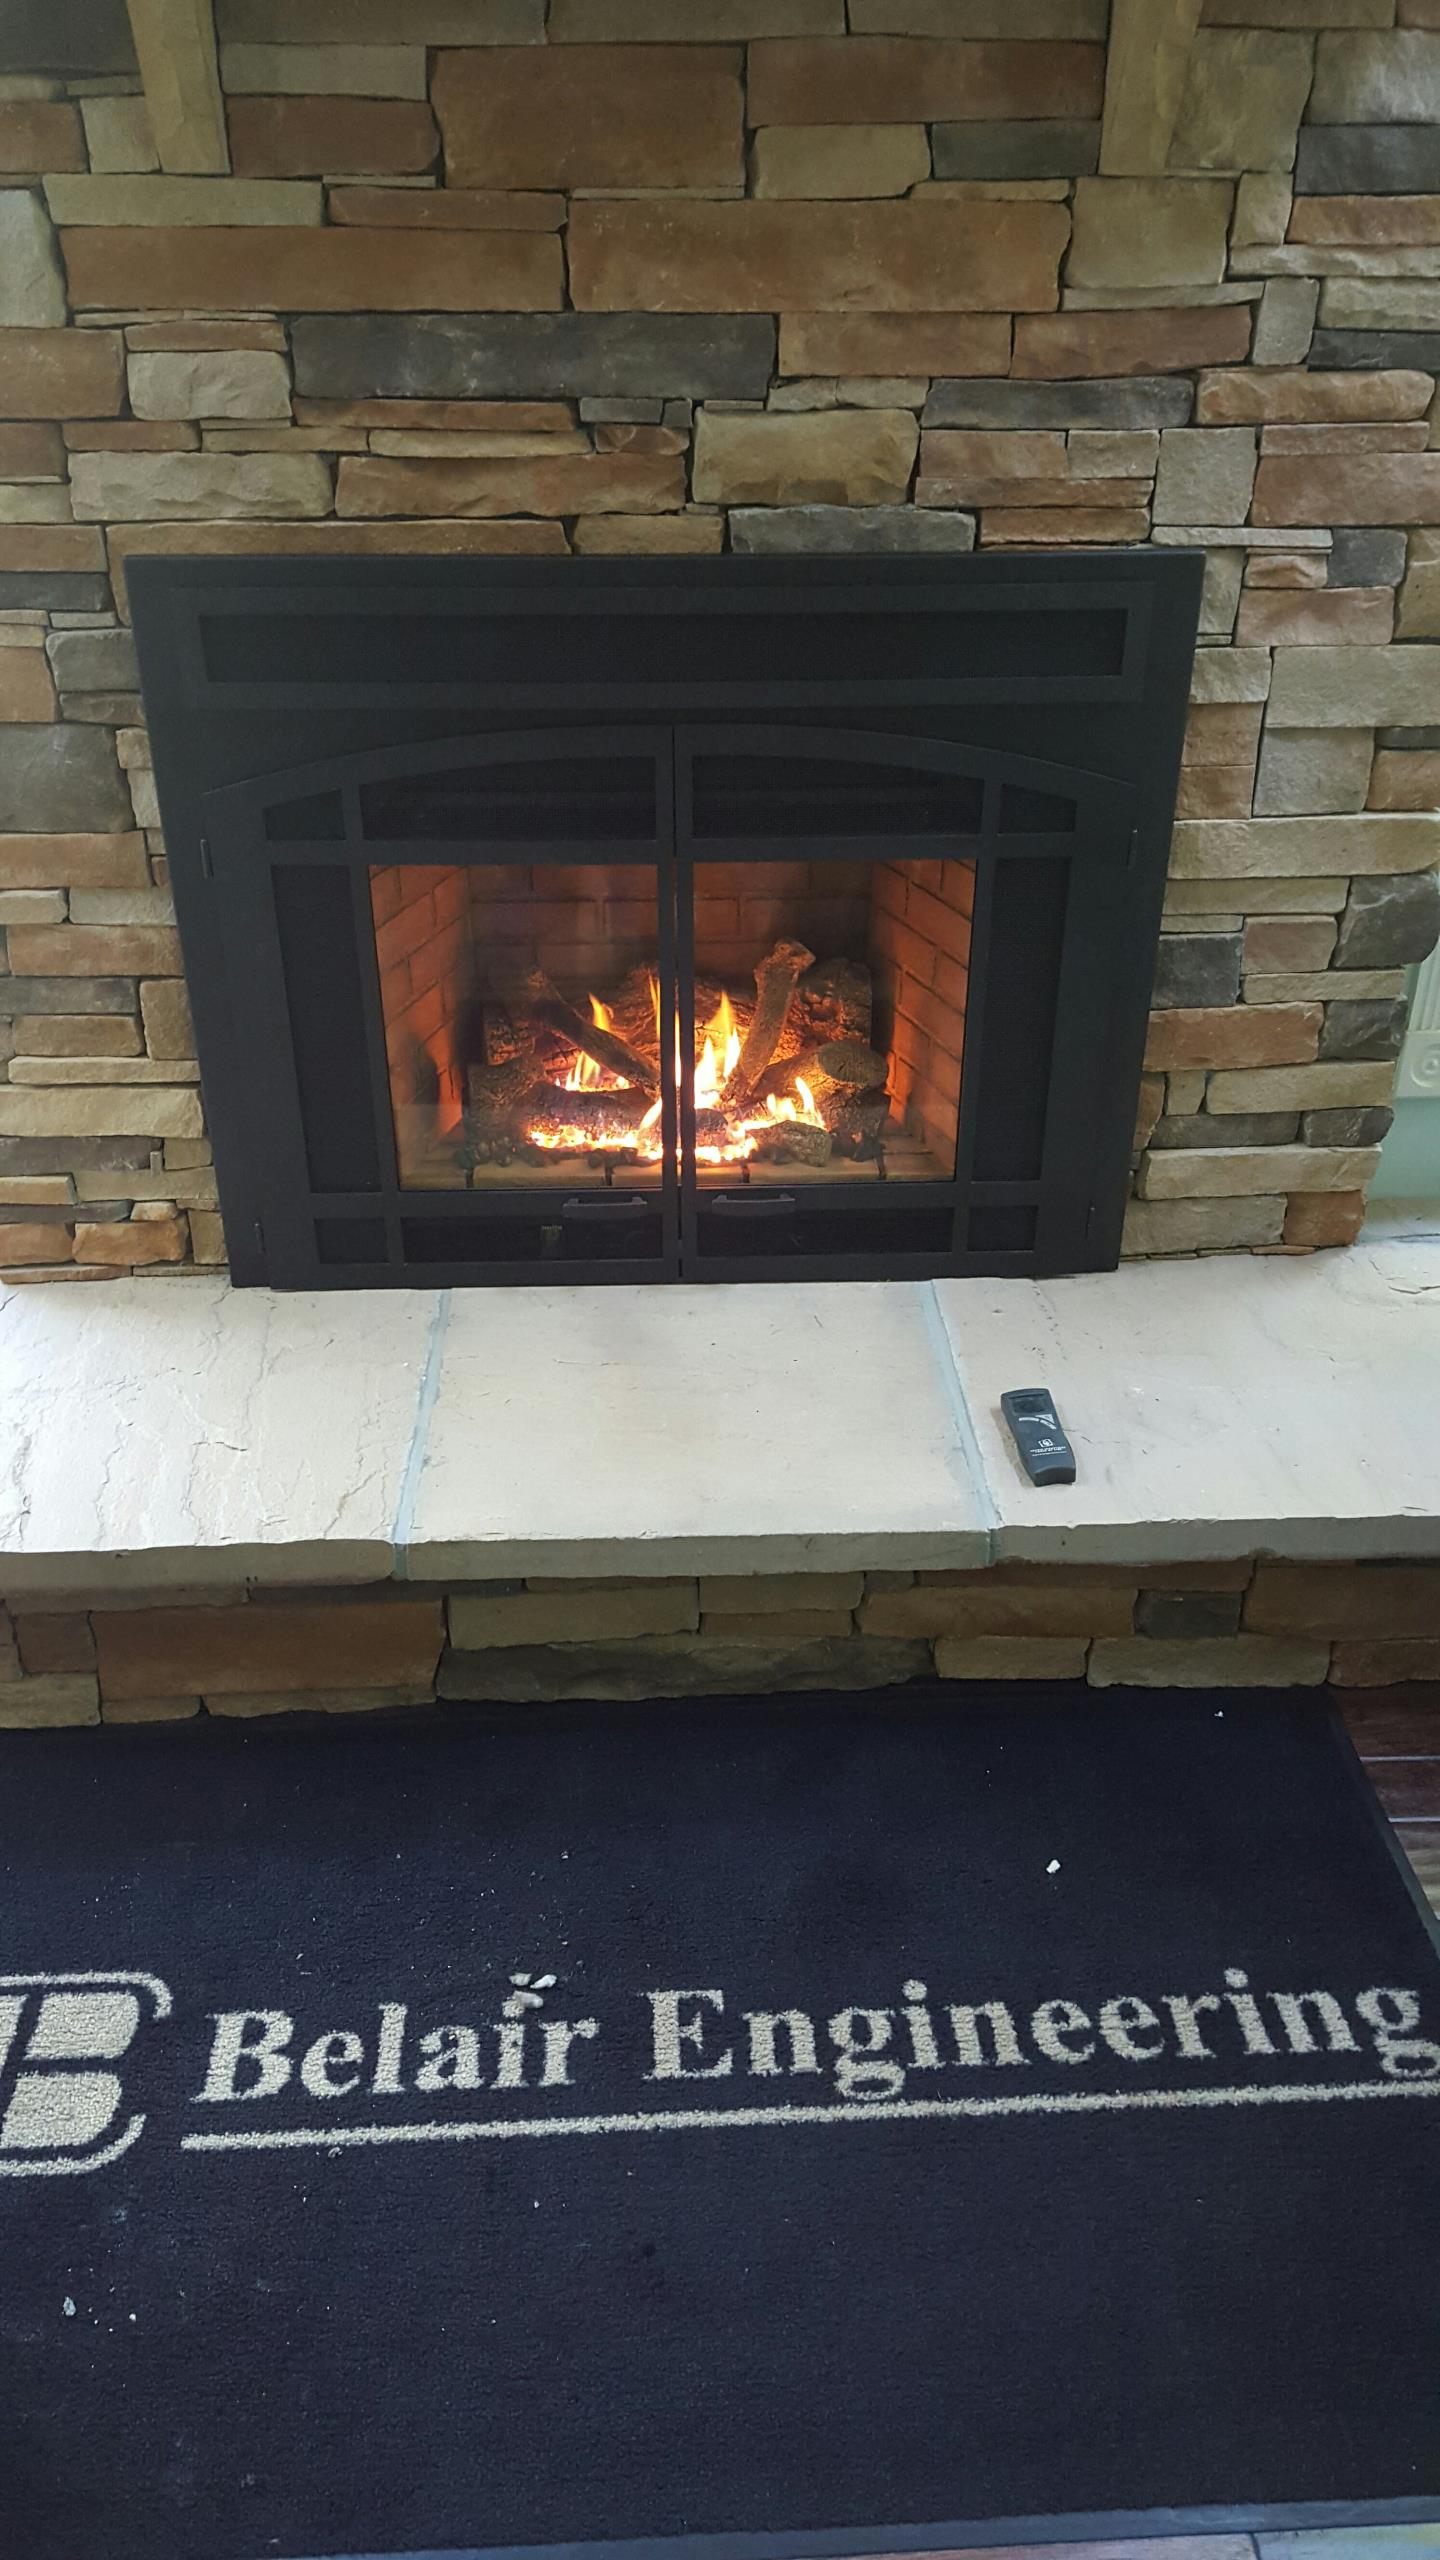 Gambrills, MD - Fireplace Extrordinair gas fireplace insert & gas logs installation repair service call Gambrills Maryland